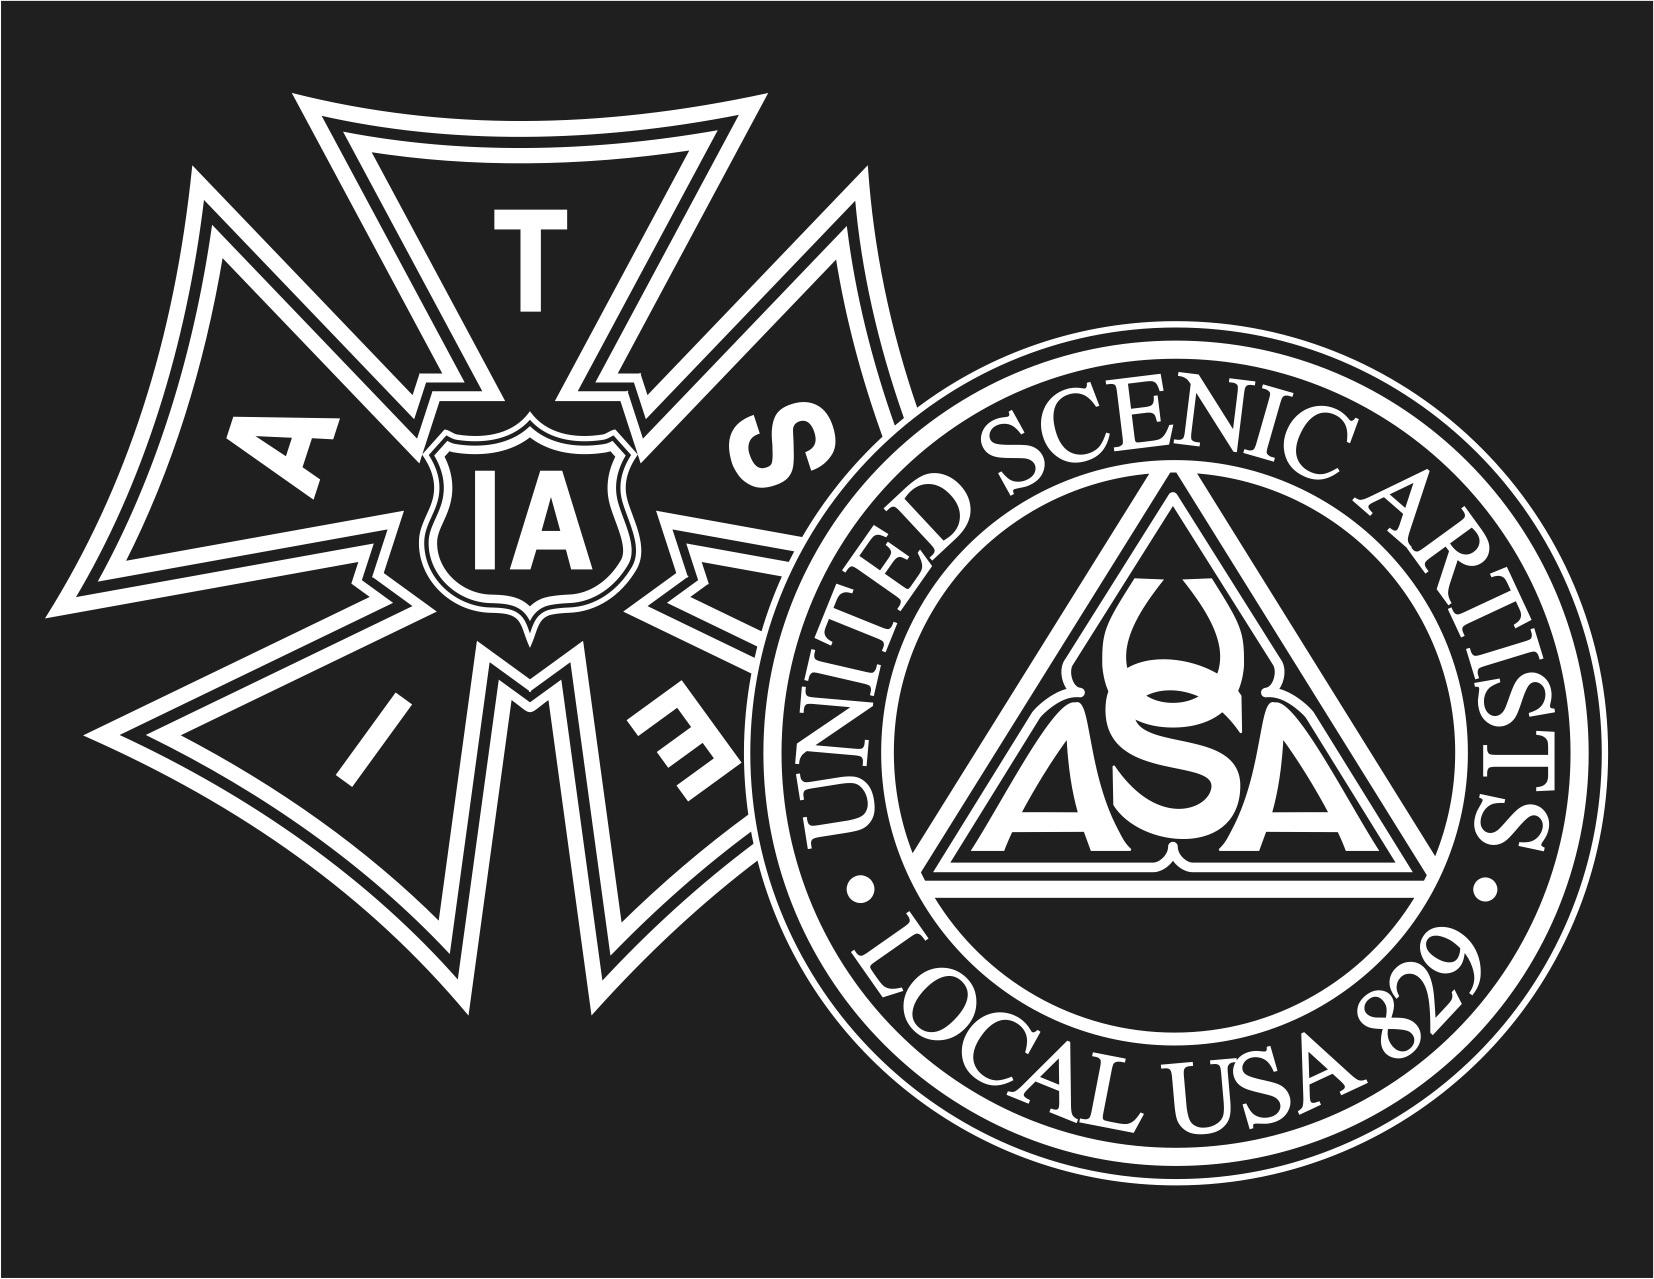 USA-829-Logo-letter-size-Wt-on-Blk.jpg